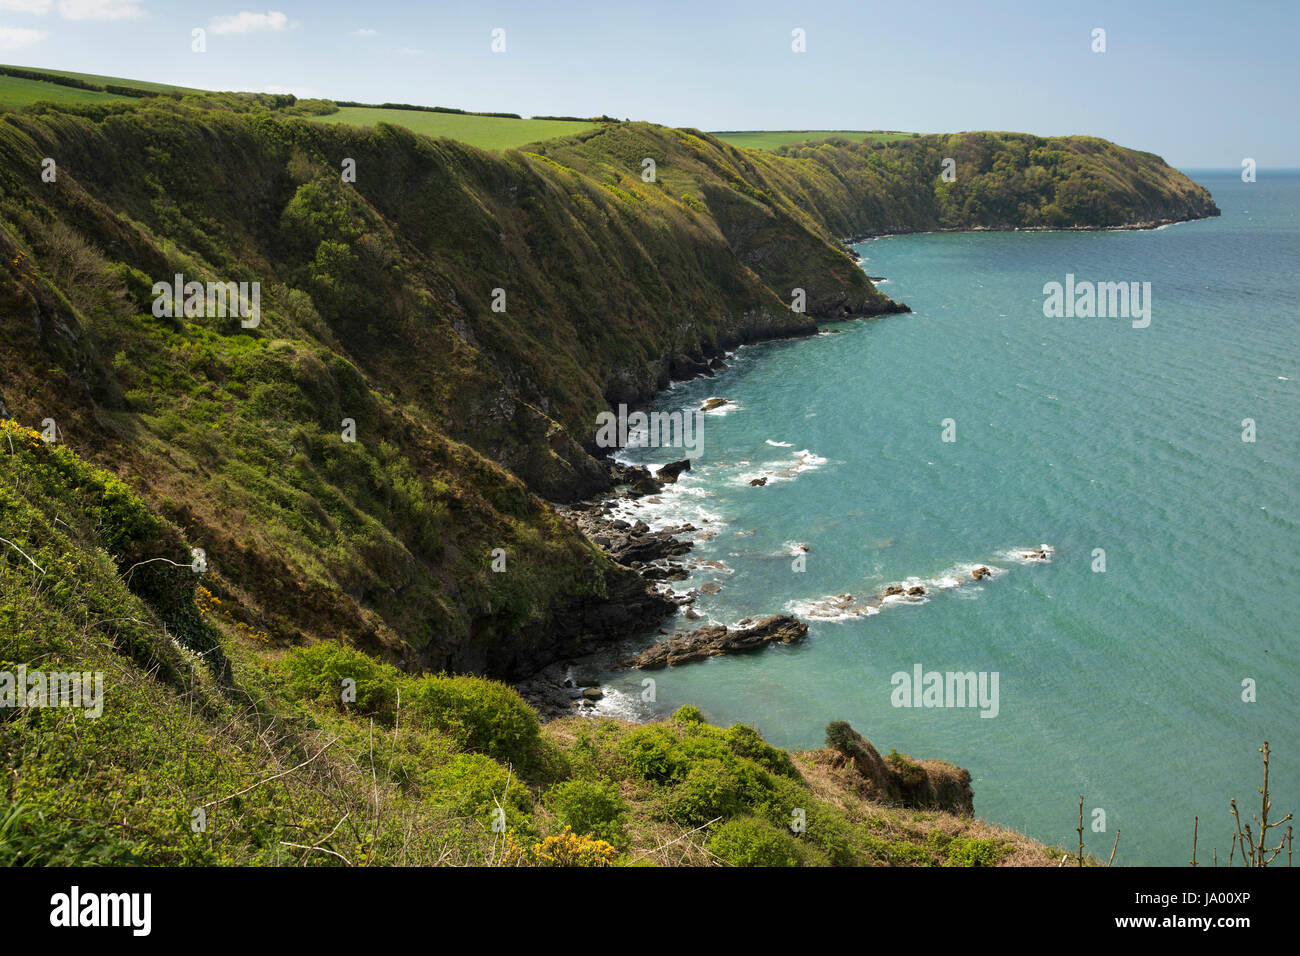 UK, Wales, Pembrokeshire, Little Haven, Borough Head above Goultrop rocks - Stock Image